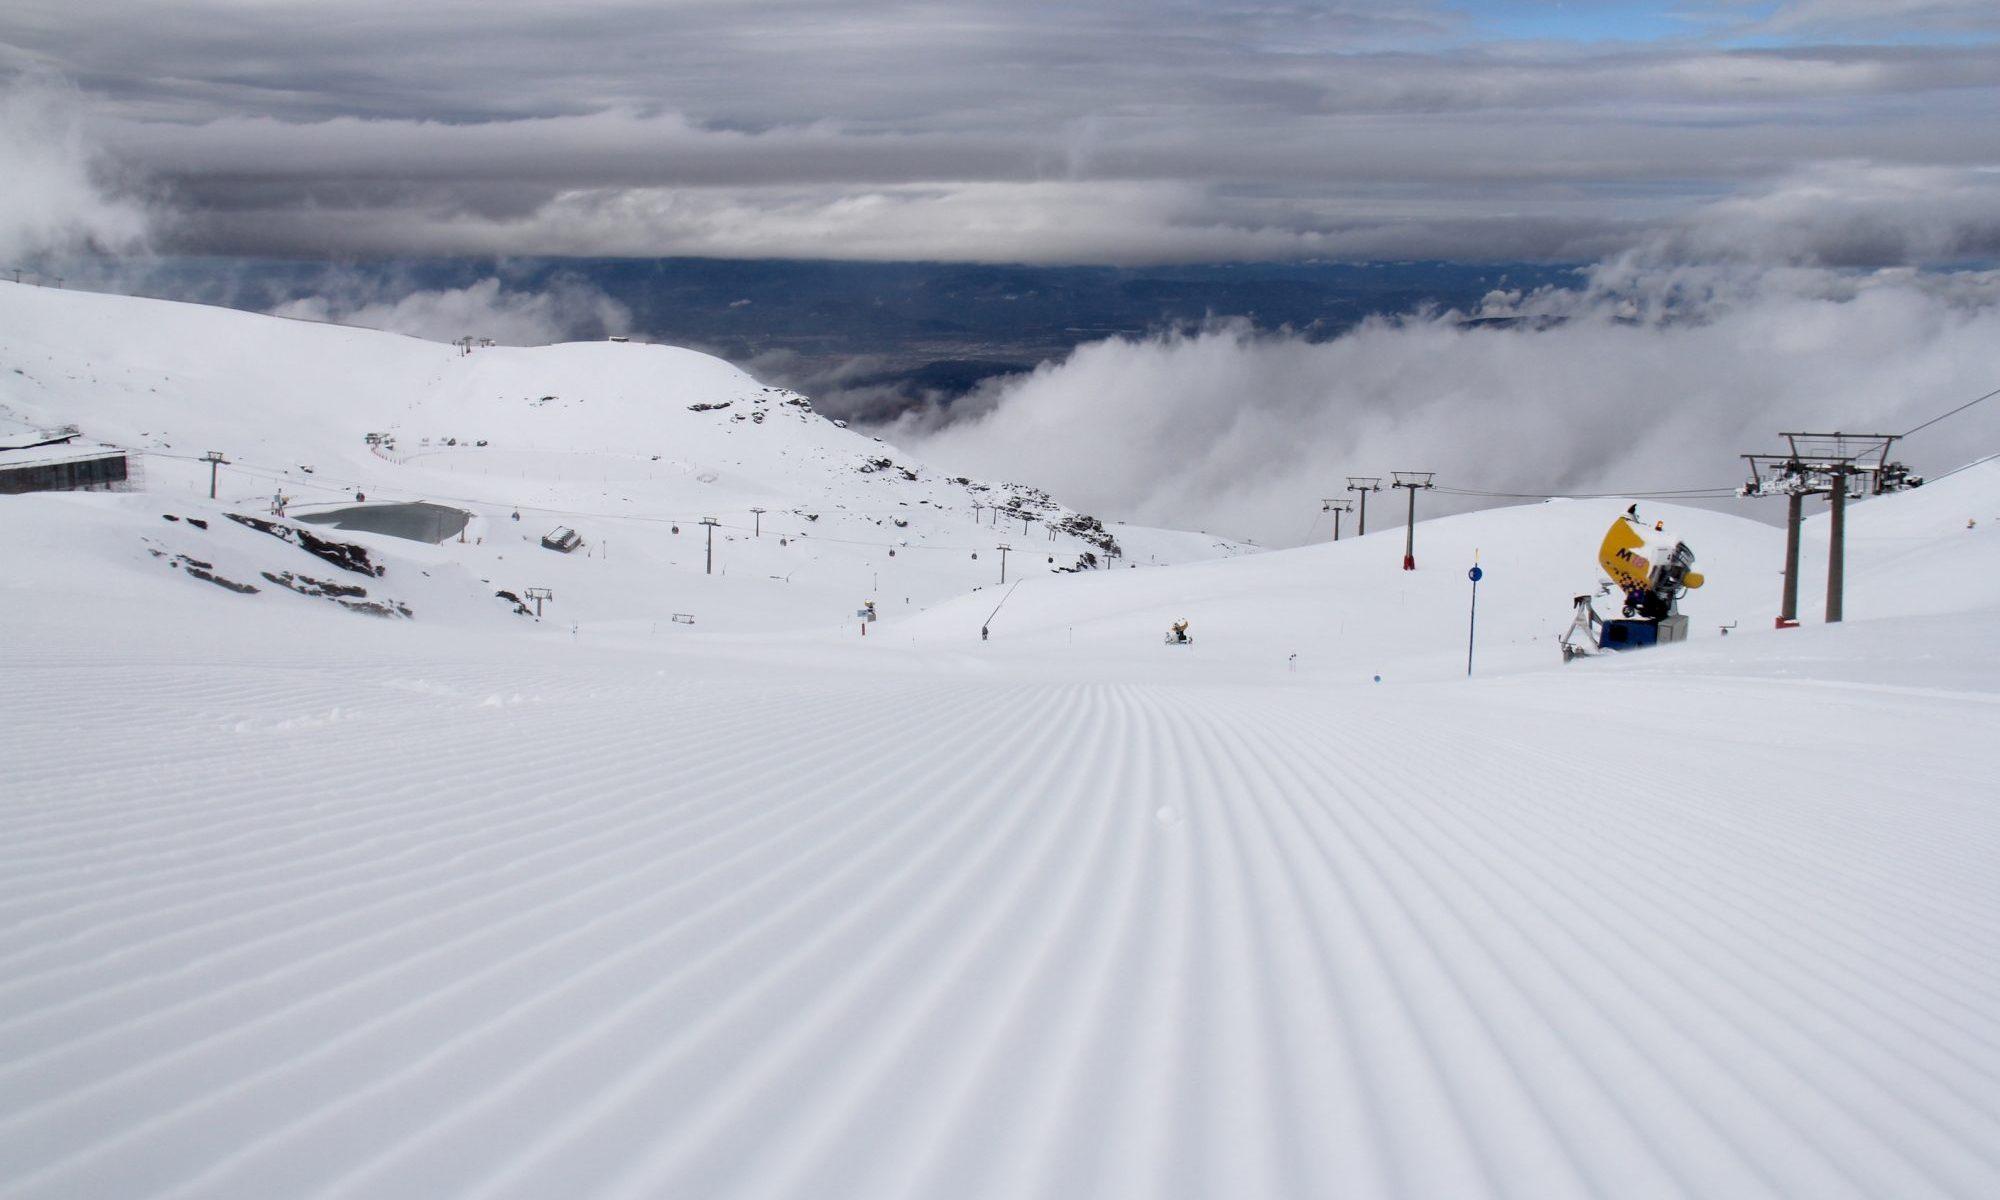 Sierra Nevada opens this Saturday 24th November, one week earlier than stipulated. Photo: Sierra Nevada.